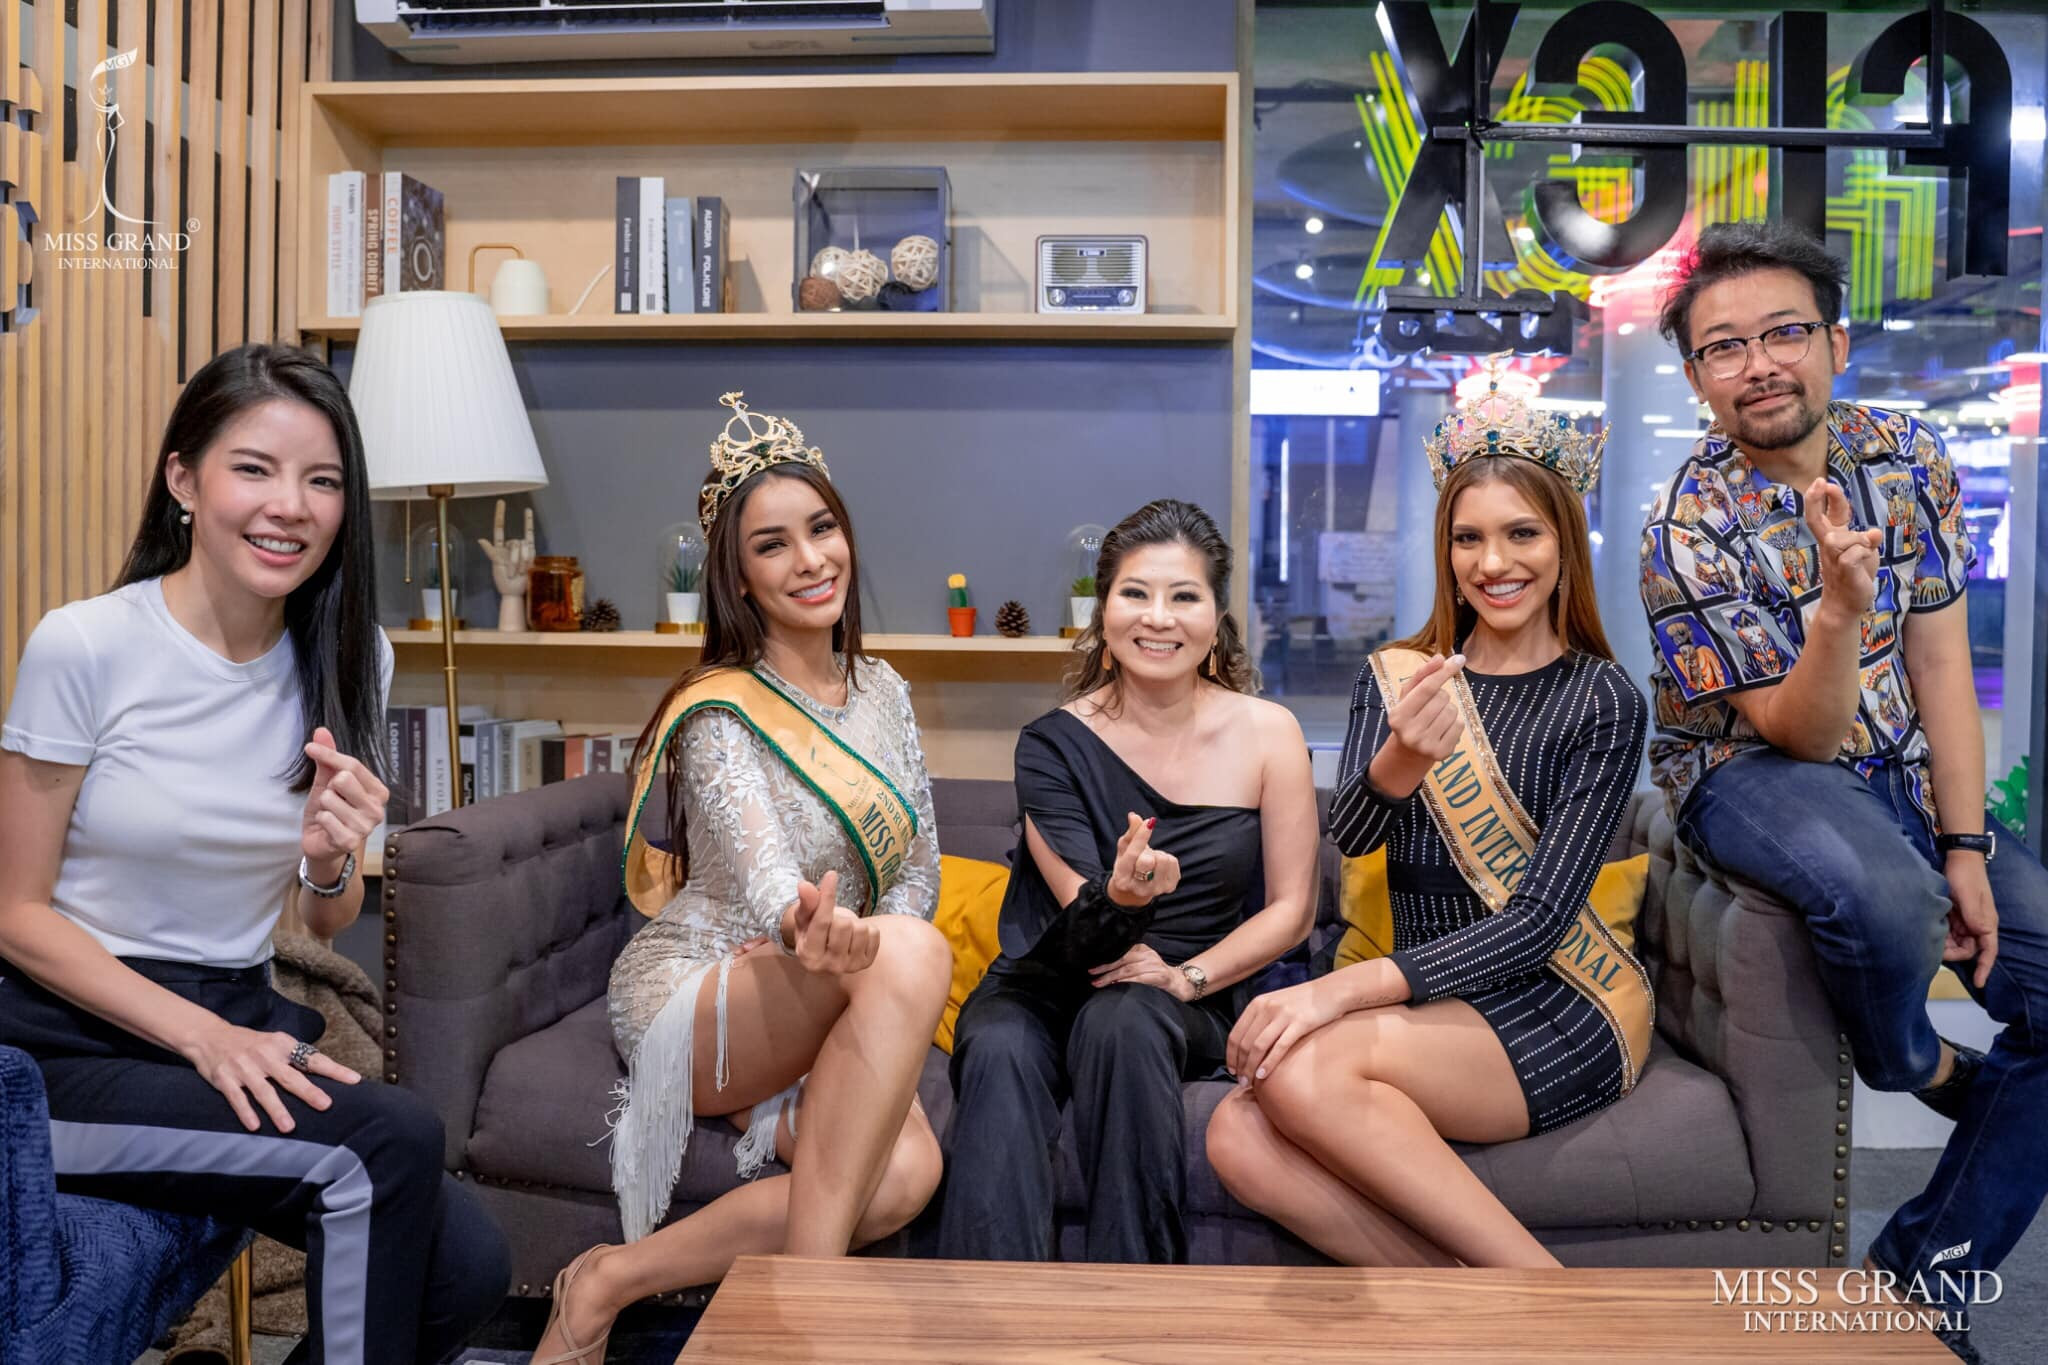 lourdes valentina figuera, miss grand international 2019. - Página 22 Fevftb10